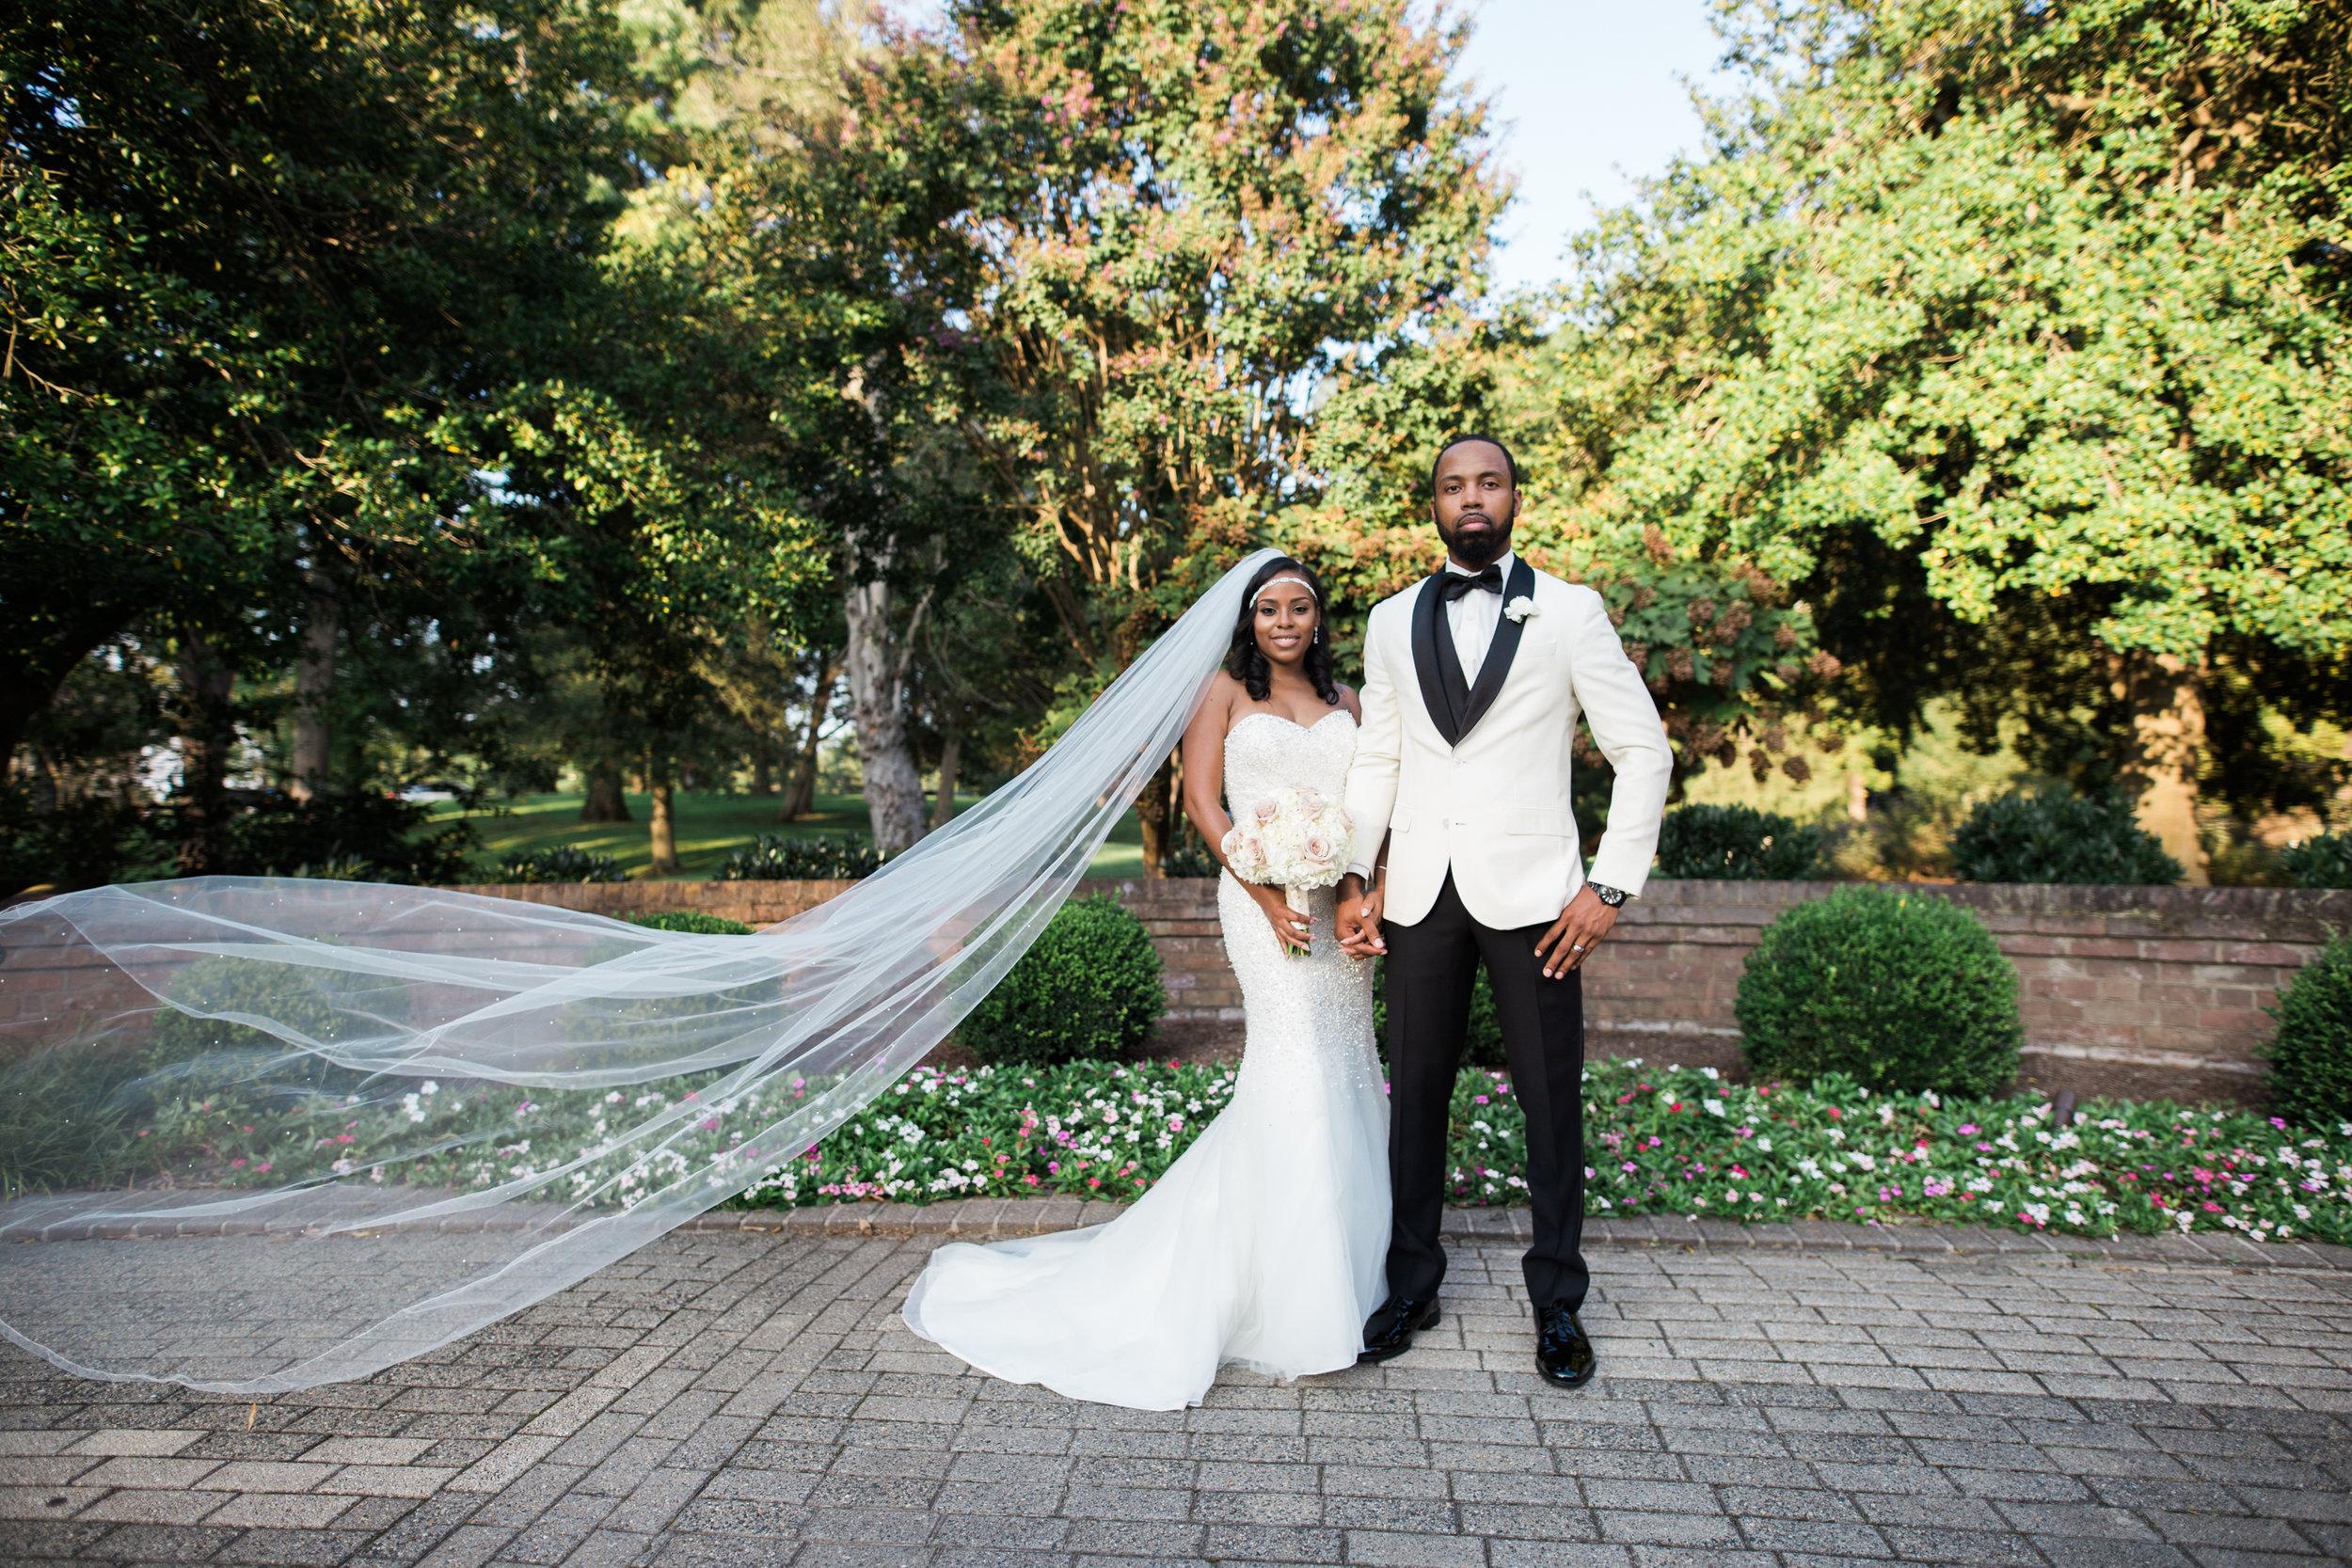 Black Wedding Photographer in Washington DC Megapixels Media.jpeg